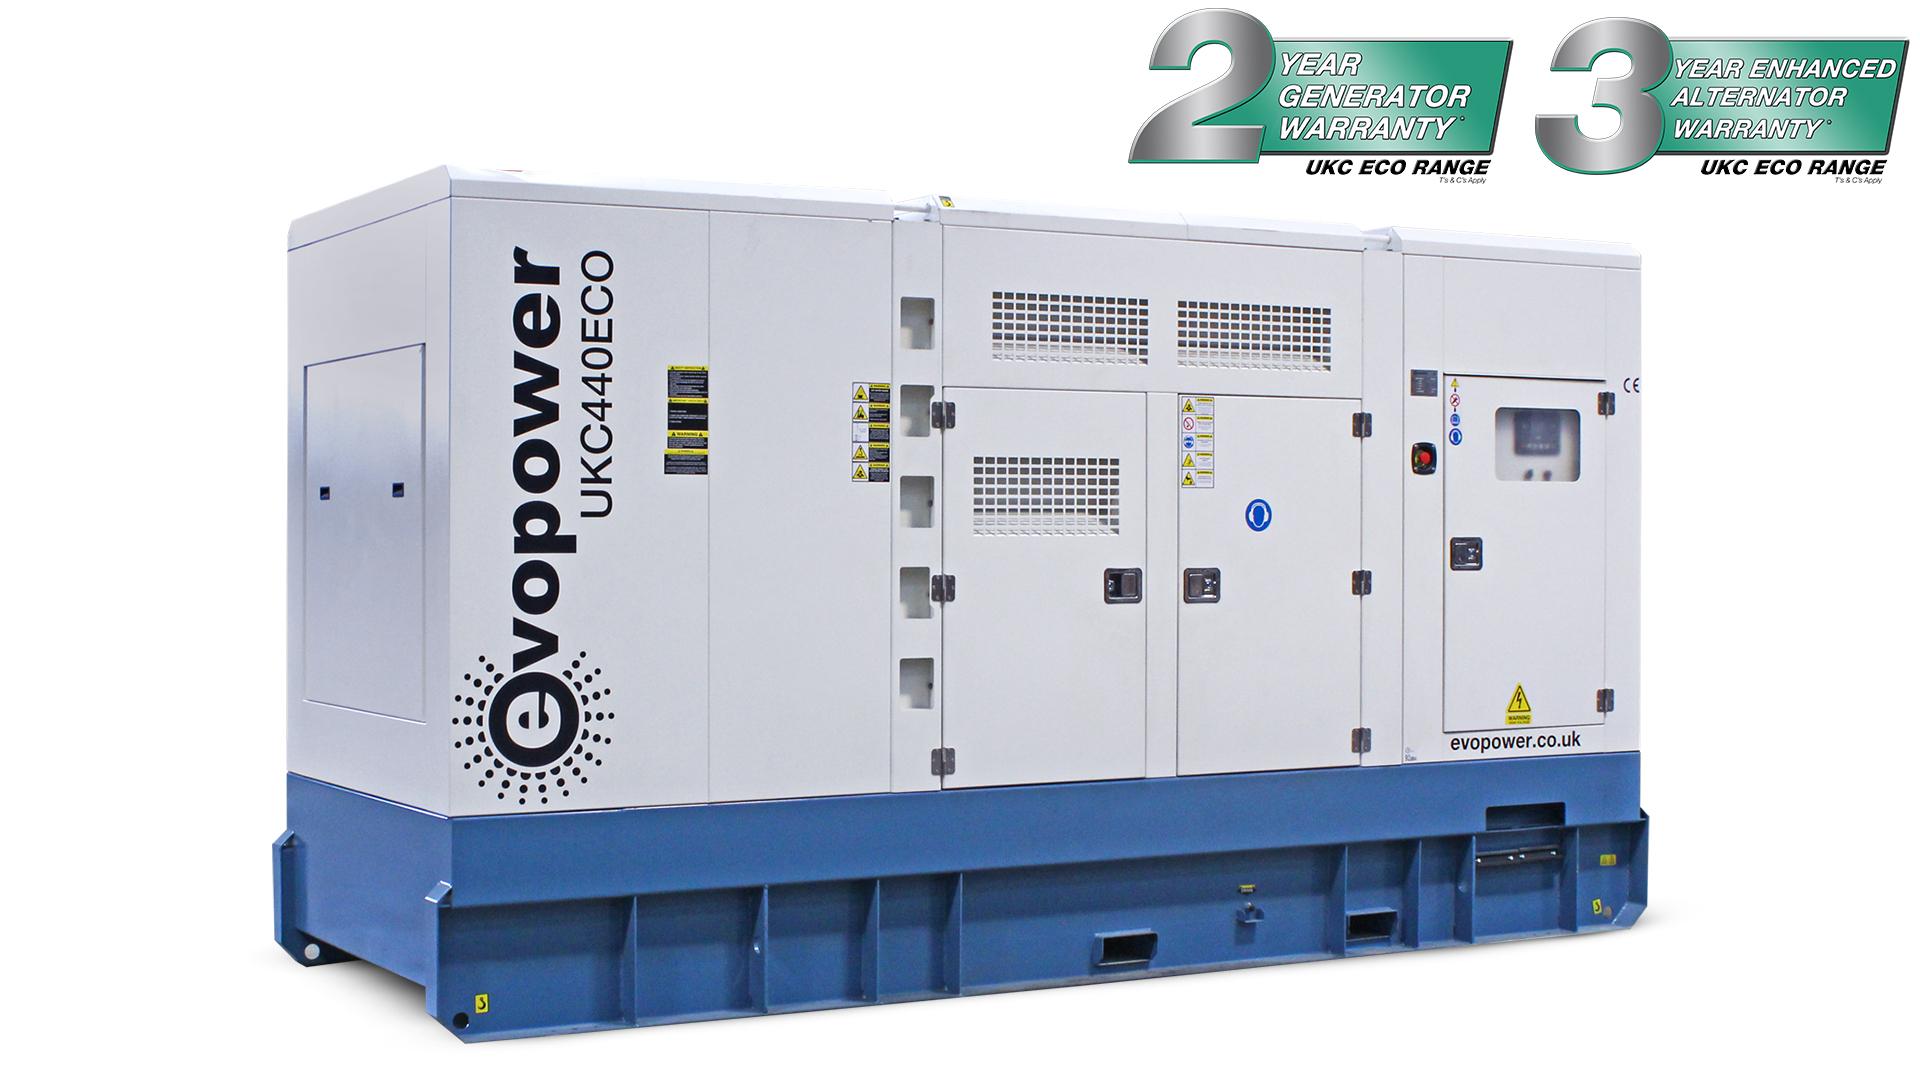 UKC440ECO-LR 440kVA Diesel Generator Main Image